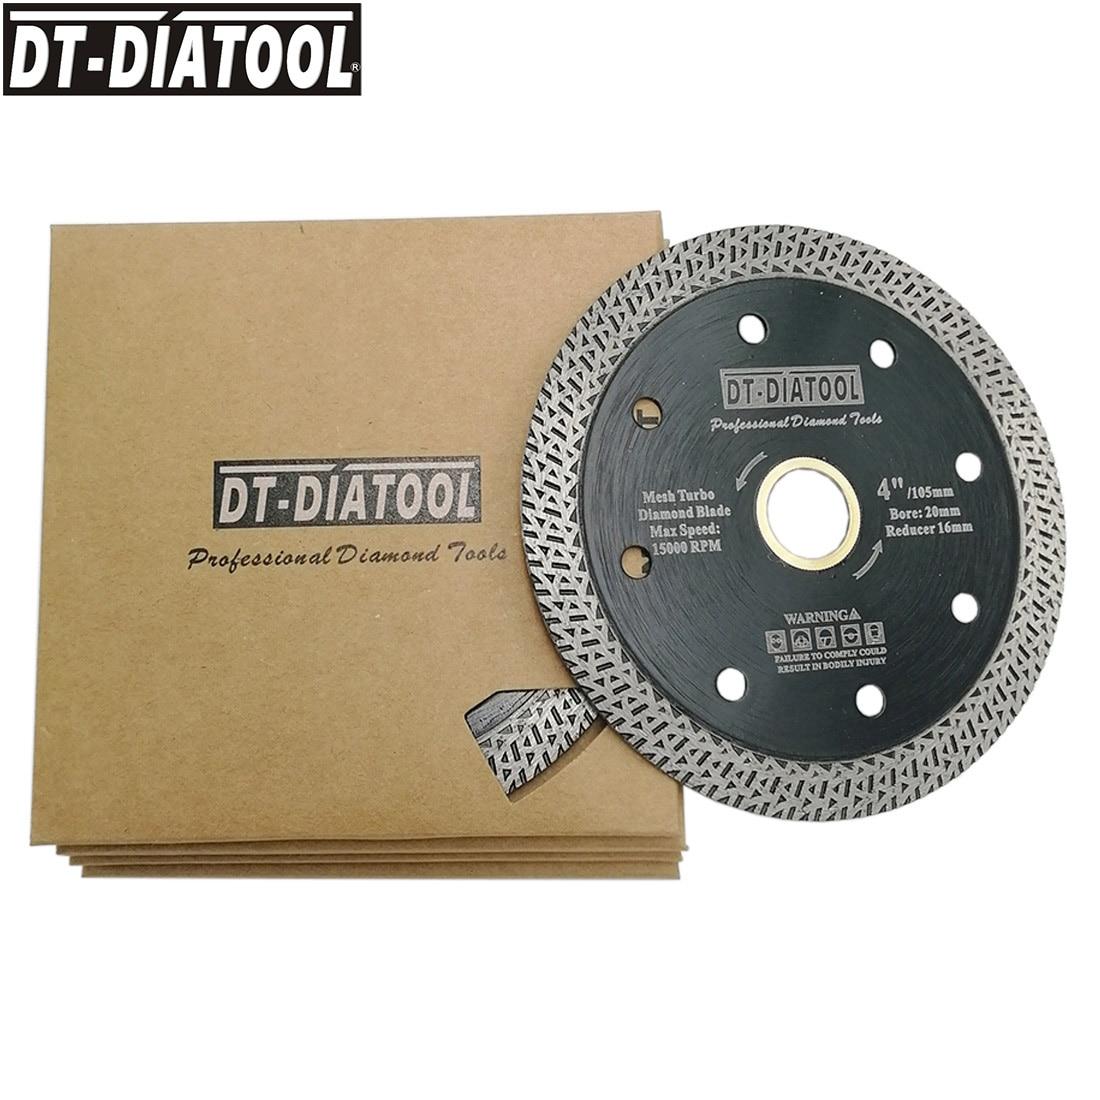 DT-DIATOOL 5pcs/pk Dia 4/4.5/5 Mesh Turbo Diamond Saw Blade Cutting Disc for Hard Material Granite Marble Cutter